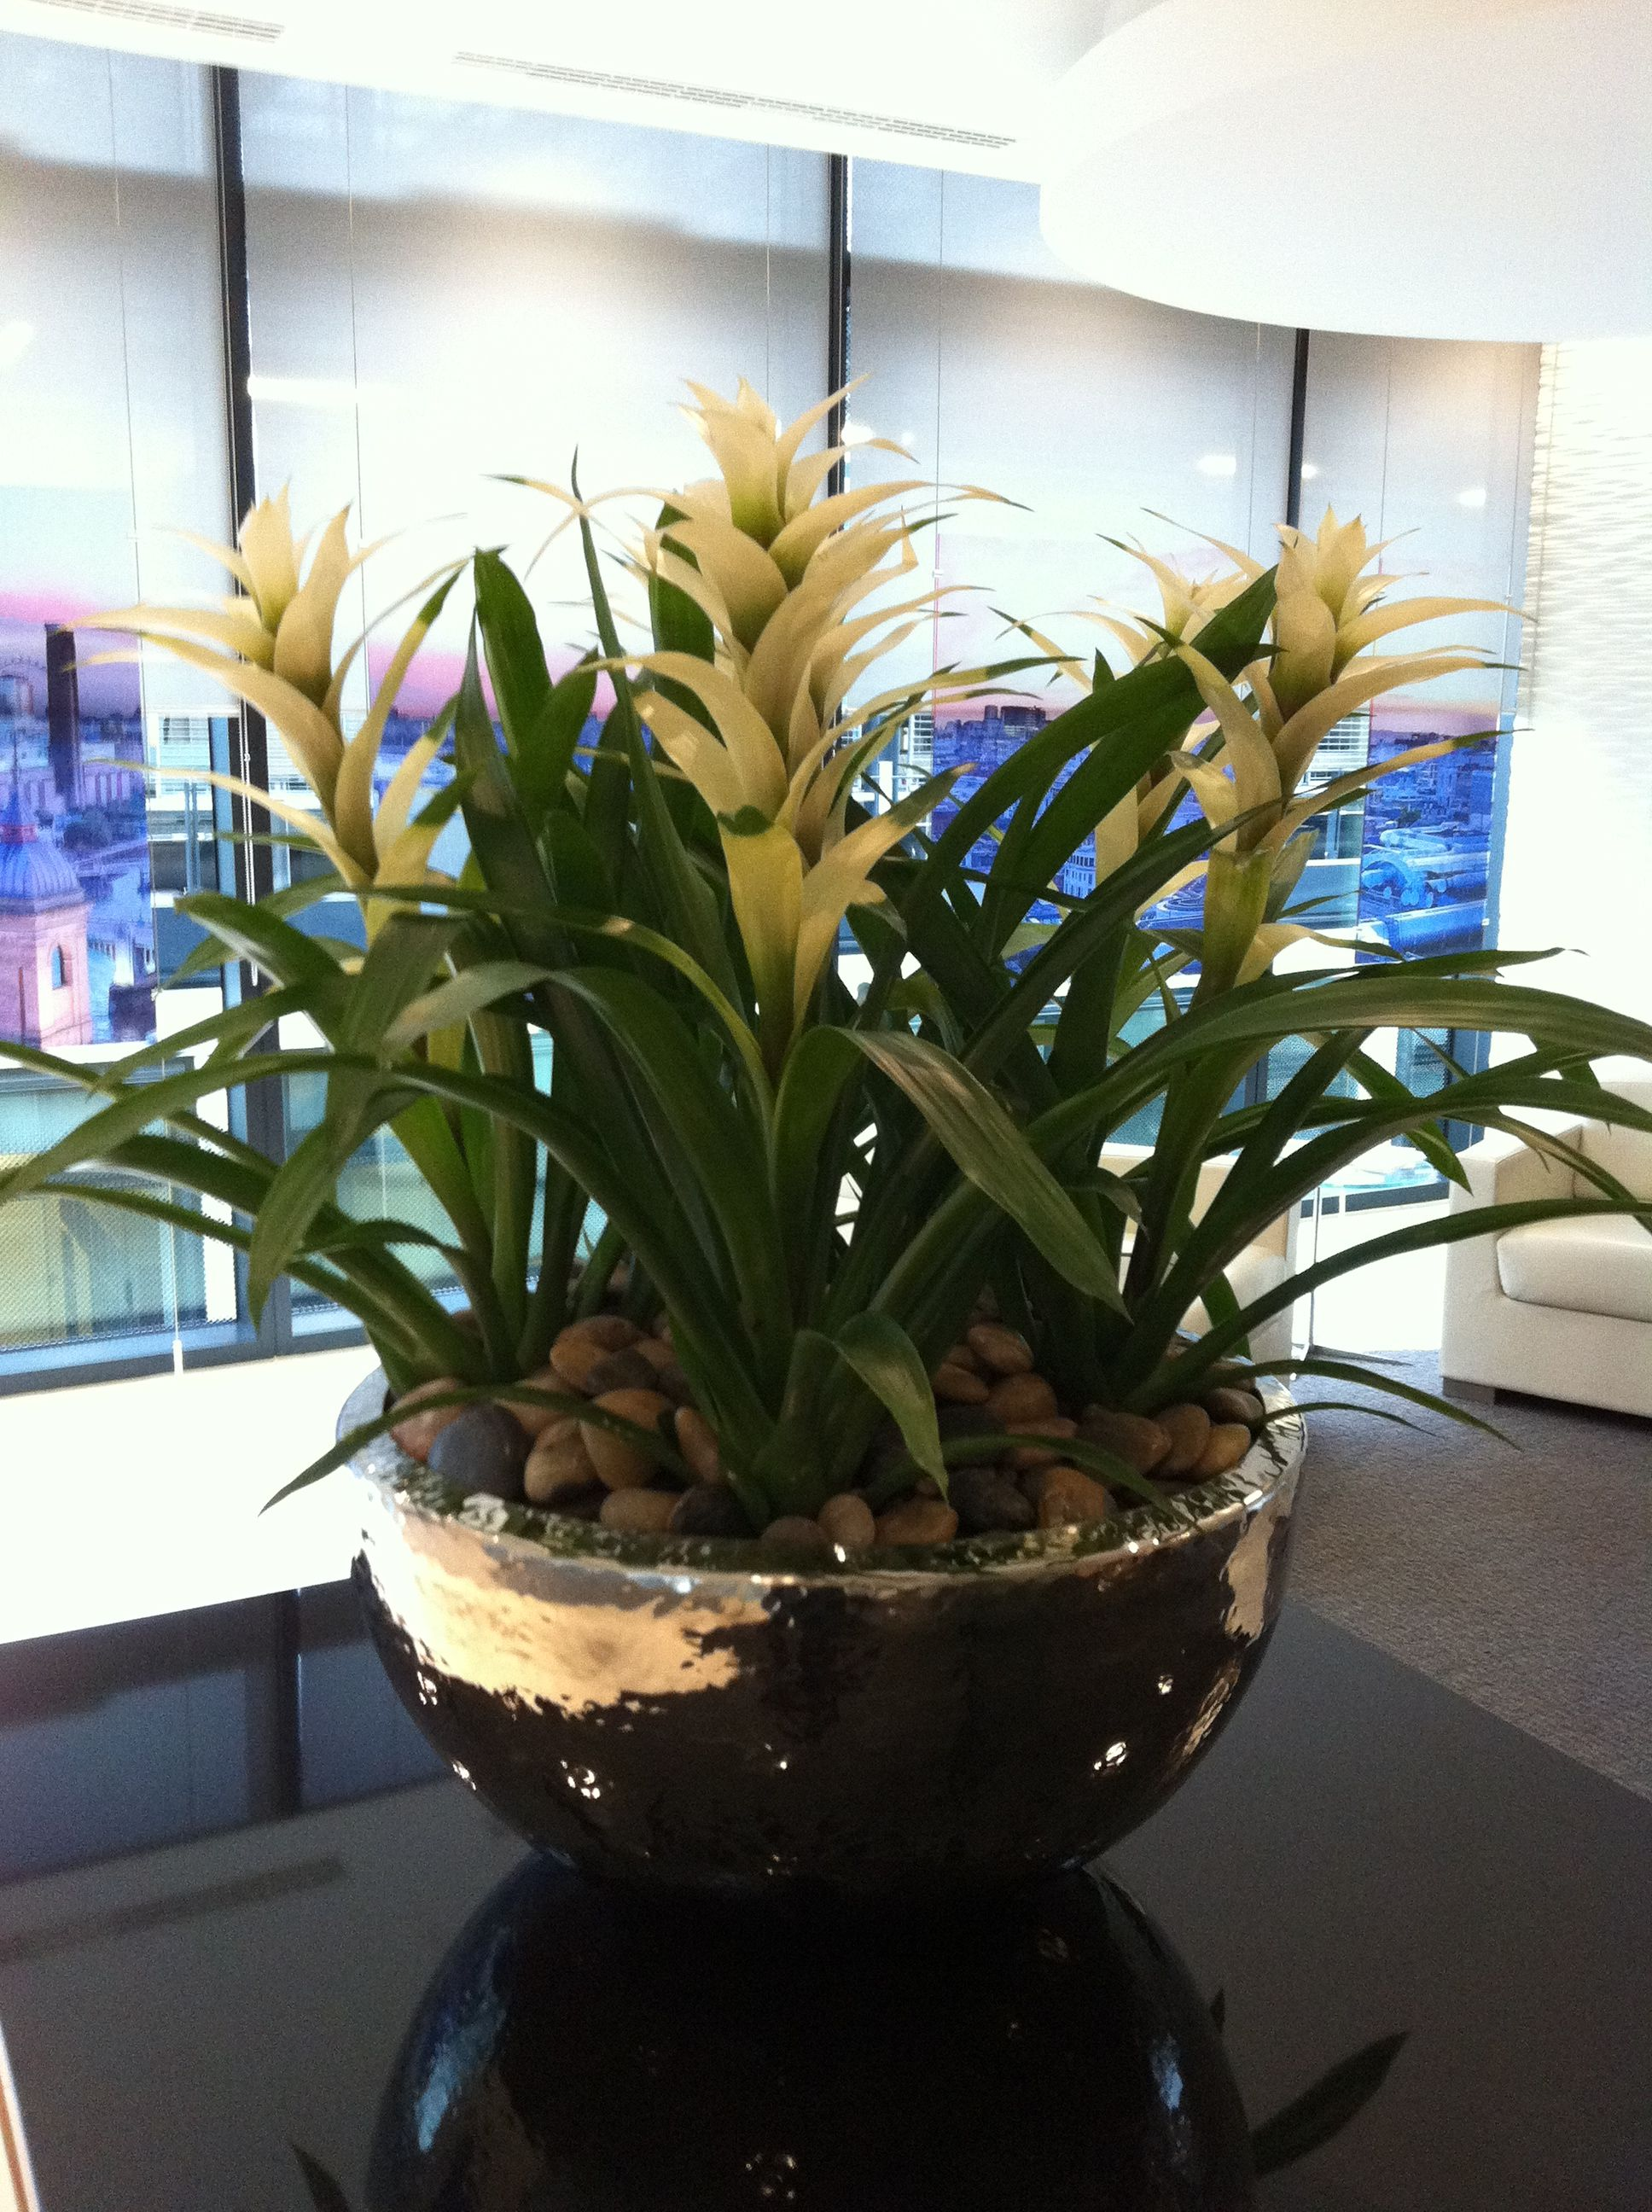 White guzmania 39 s planted in hammered aluminium bowl in for Pflanzengestaltung garten